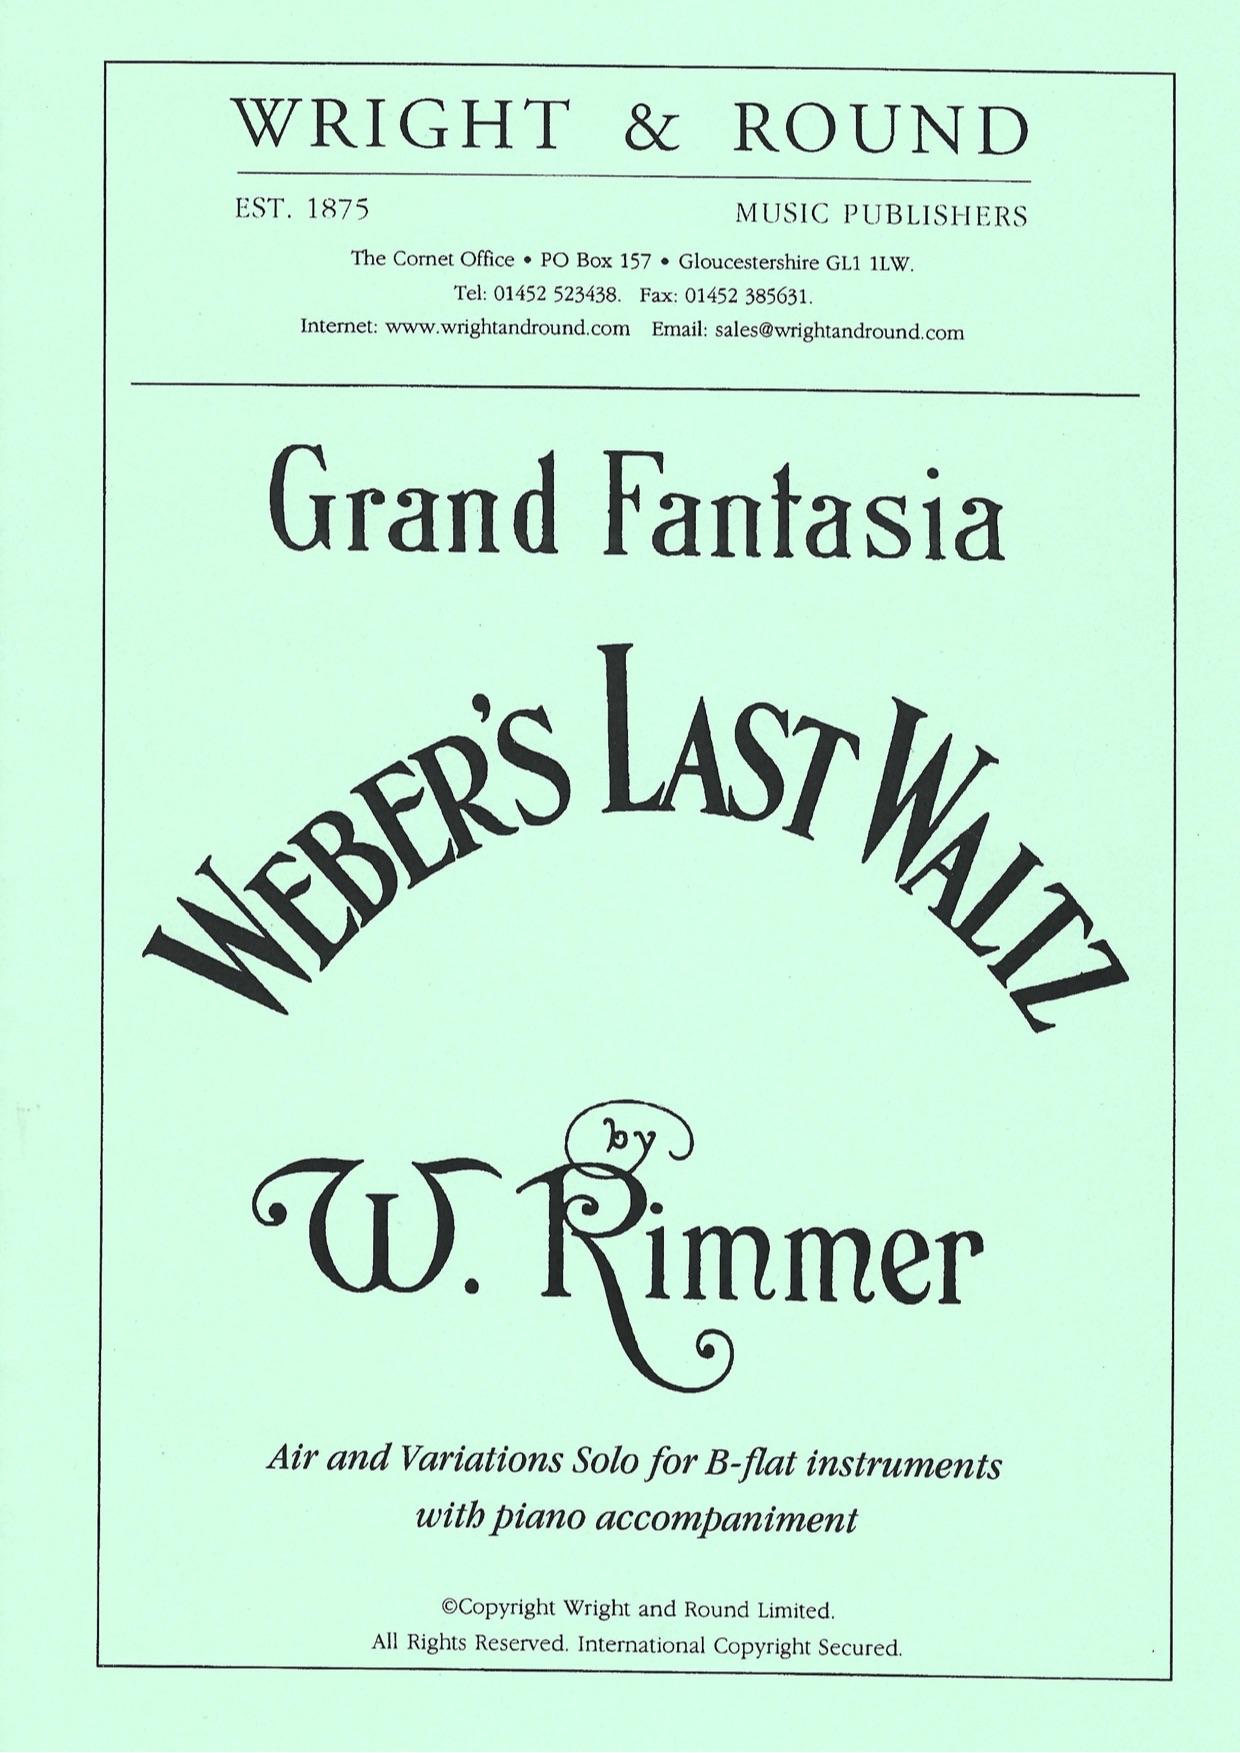 Weber's Last Waltz - William Rimmer - Euphonium and Piano